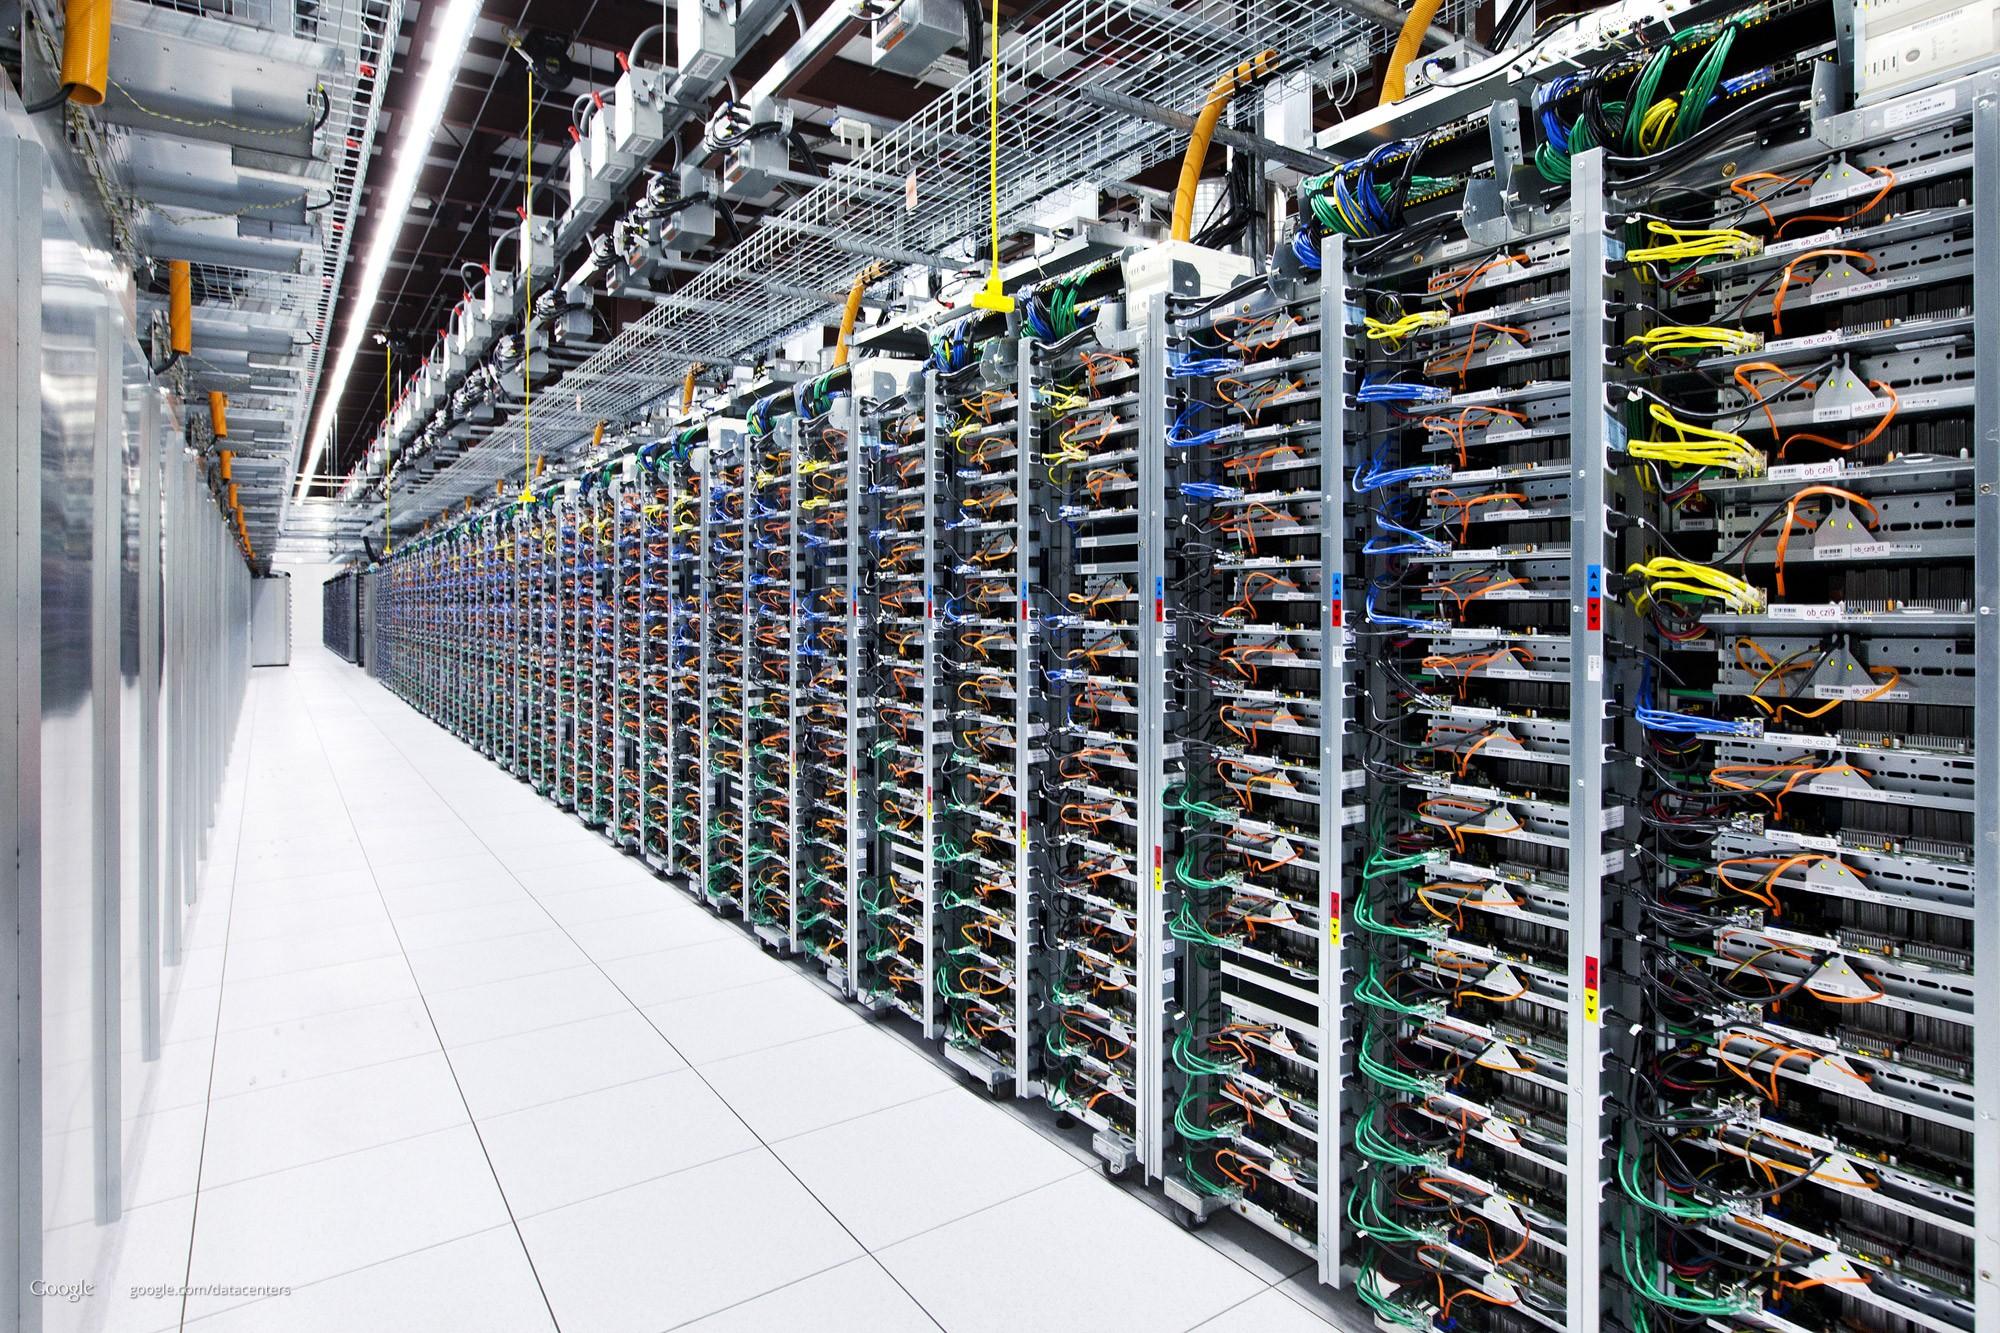 veri-merkezi